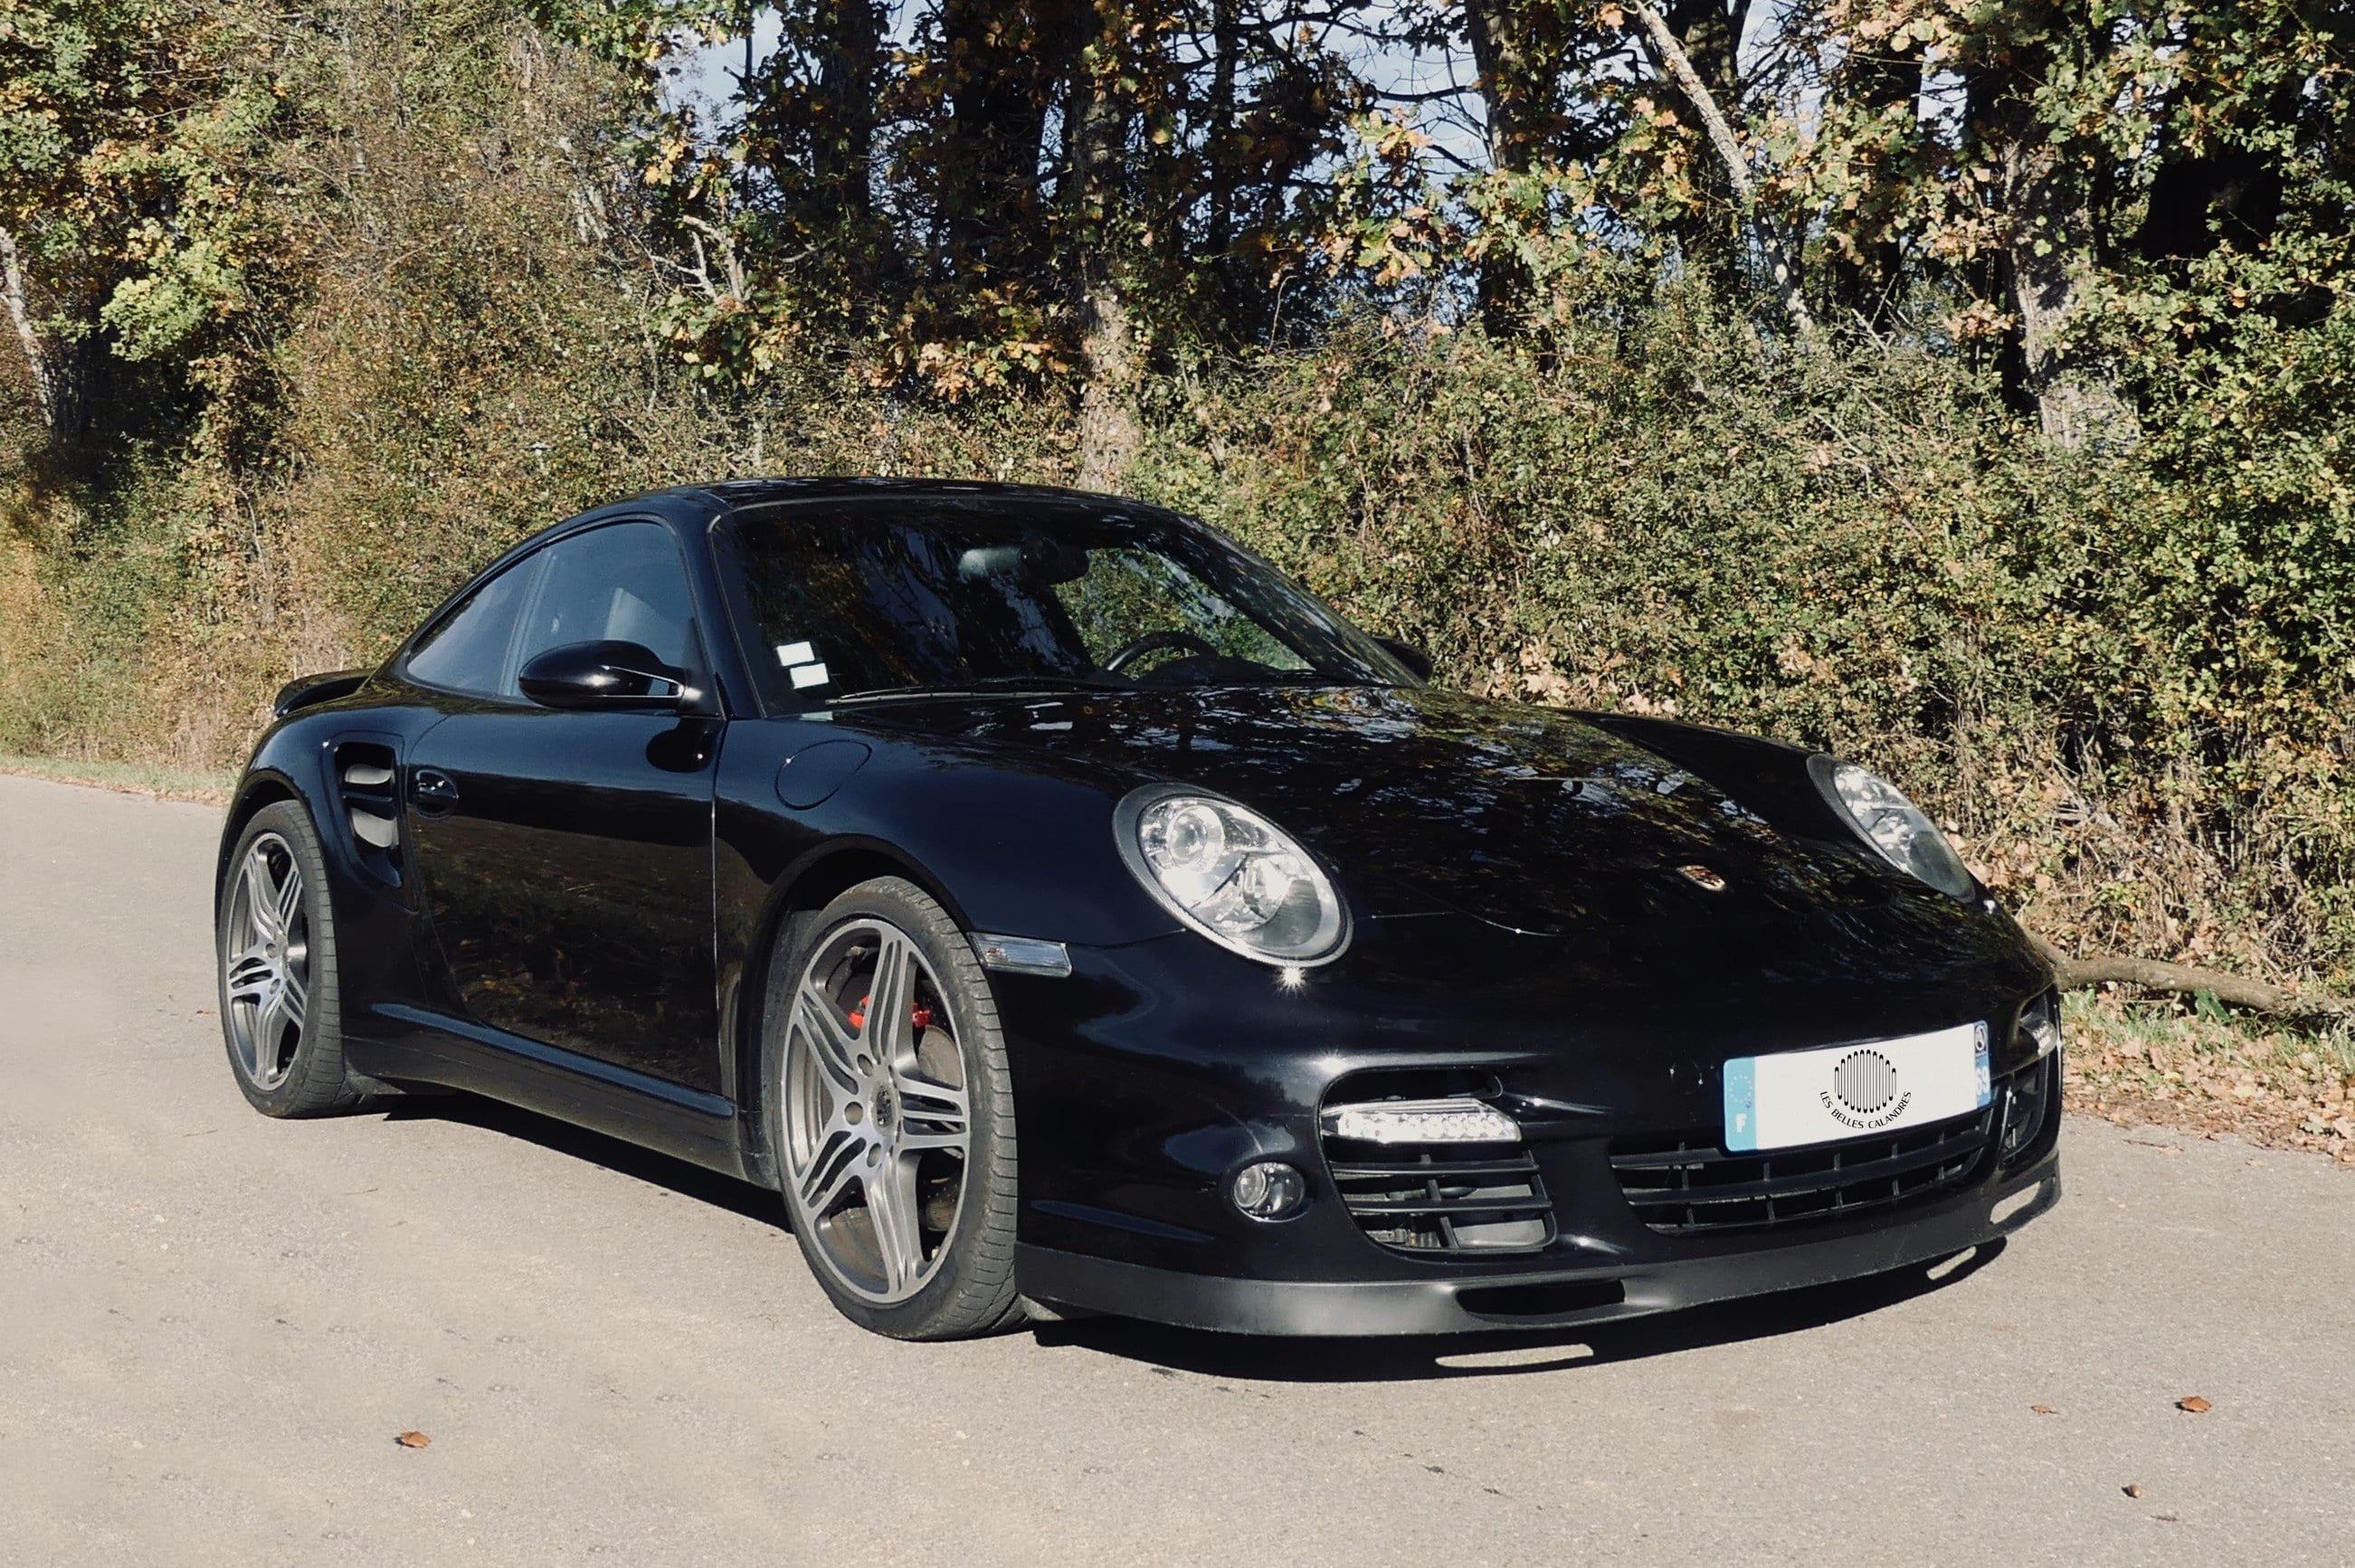 PORSCHE 911 997 Turbo 0